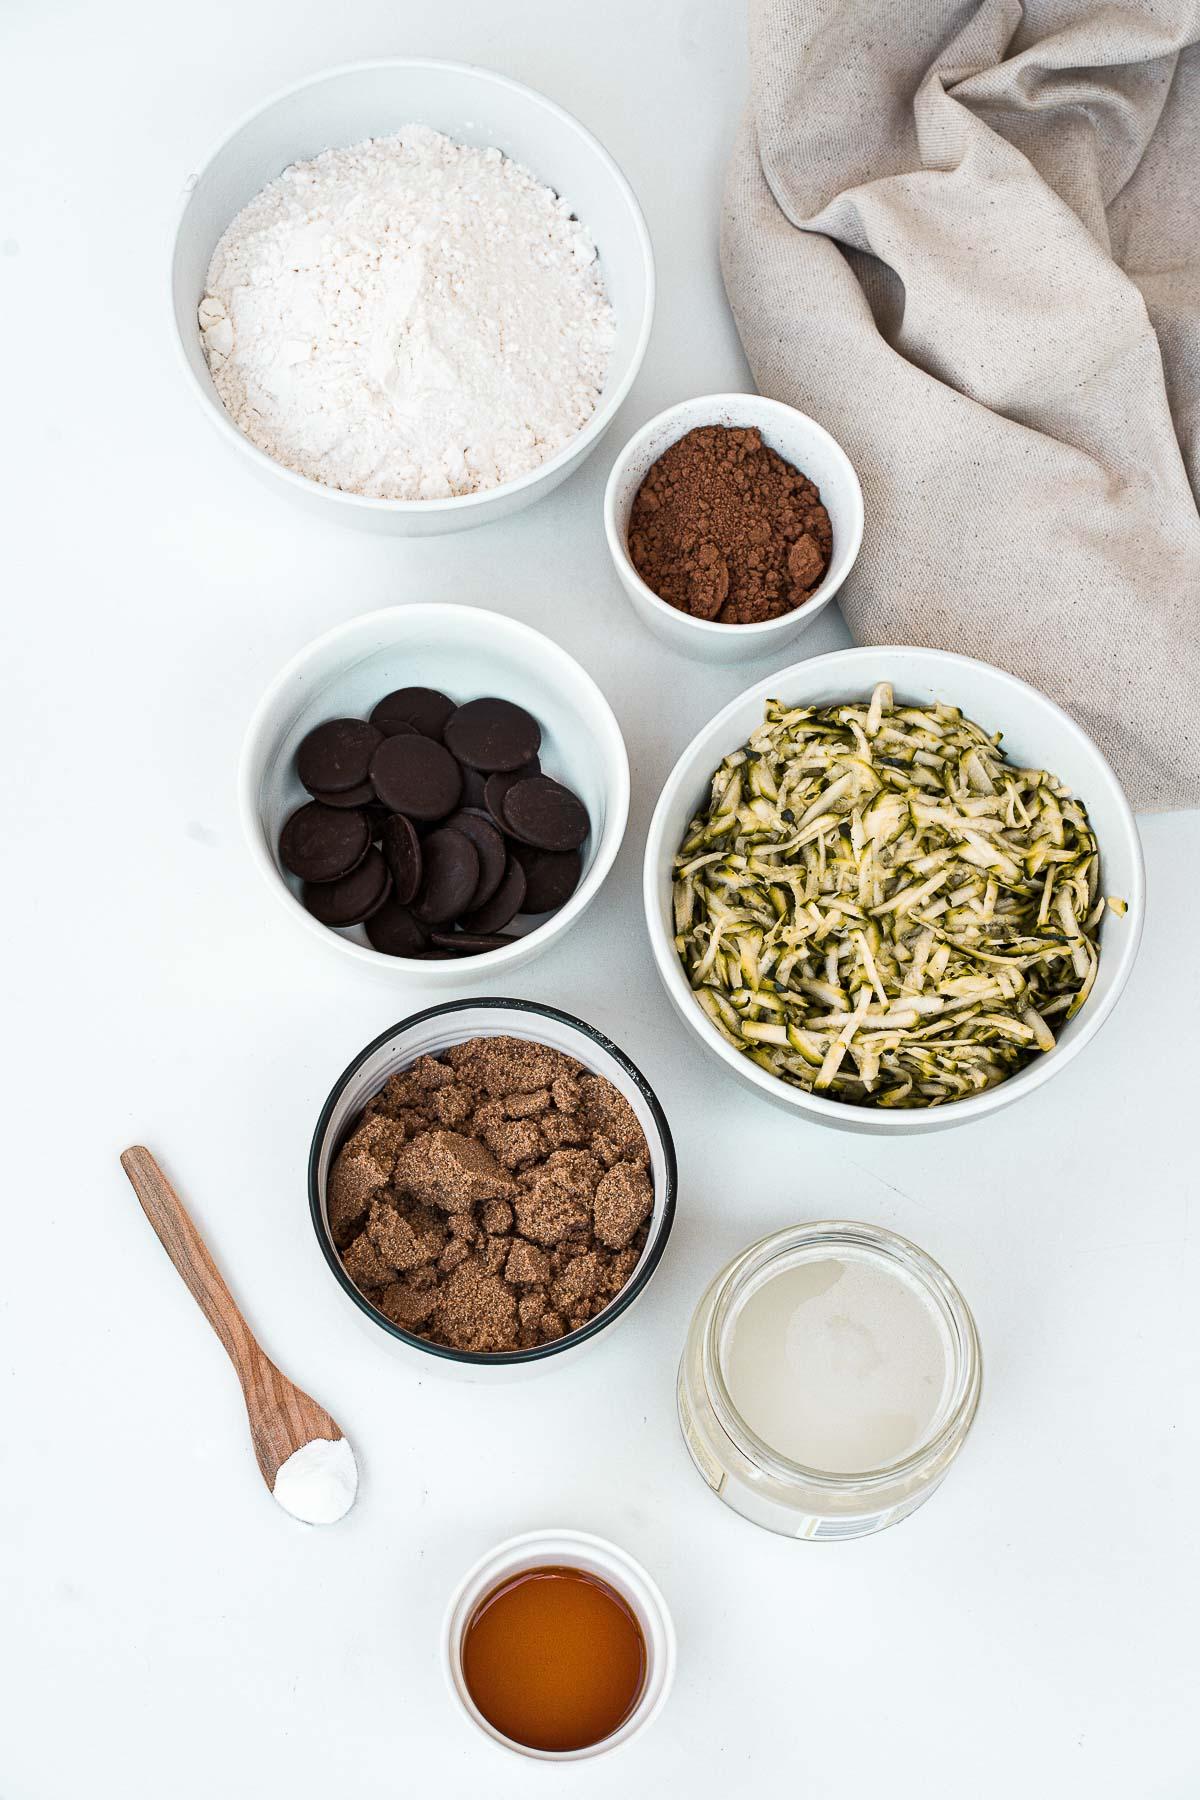 Ingredients to make zucchini brownies.